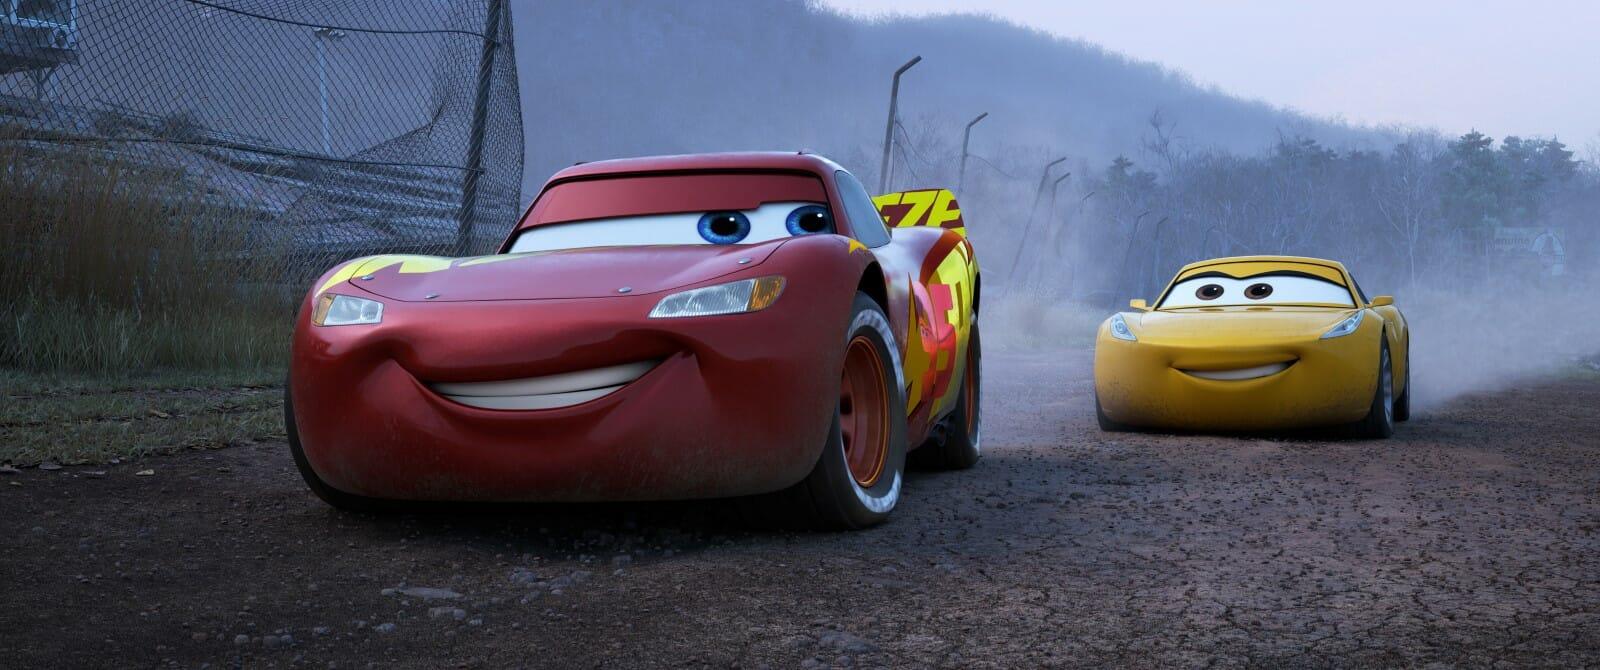 Cars-3-Flash